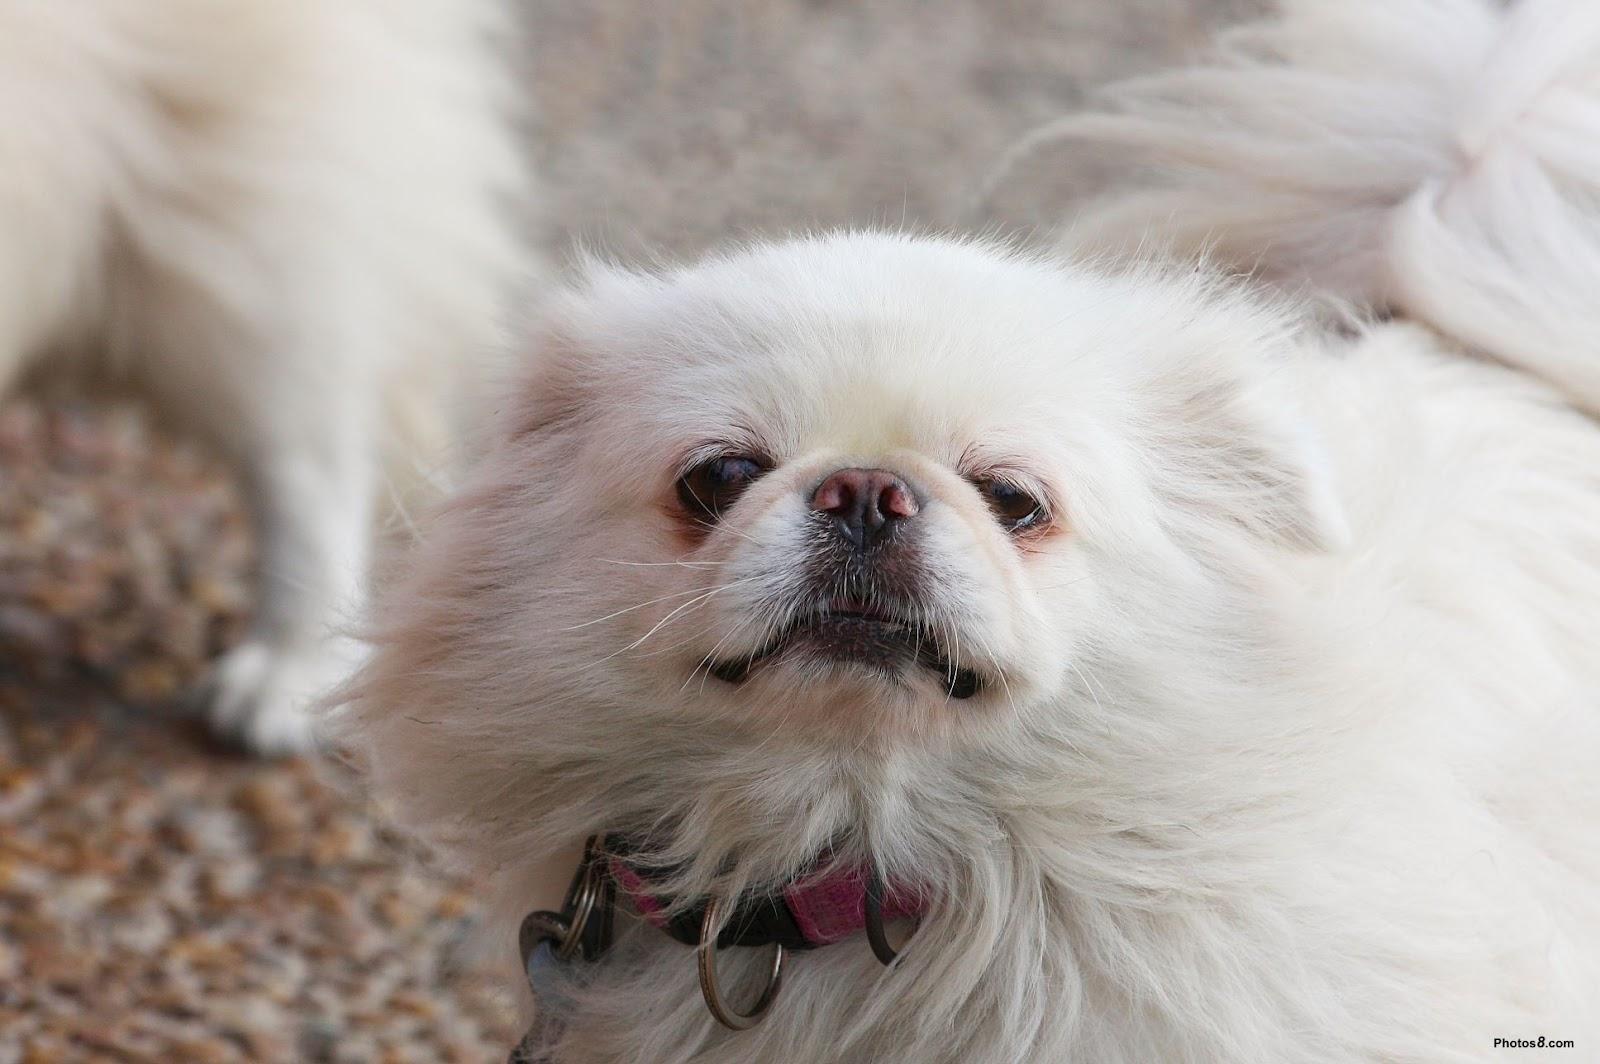 Pekingese Dogs For Sale In Uk